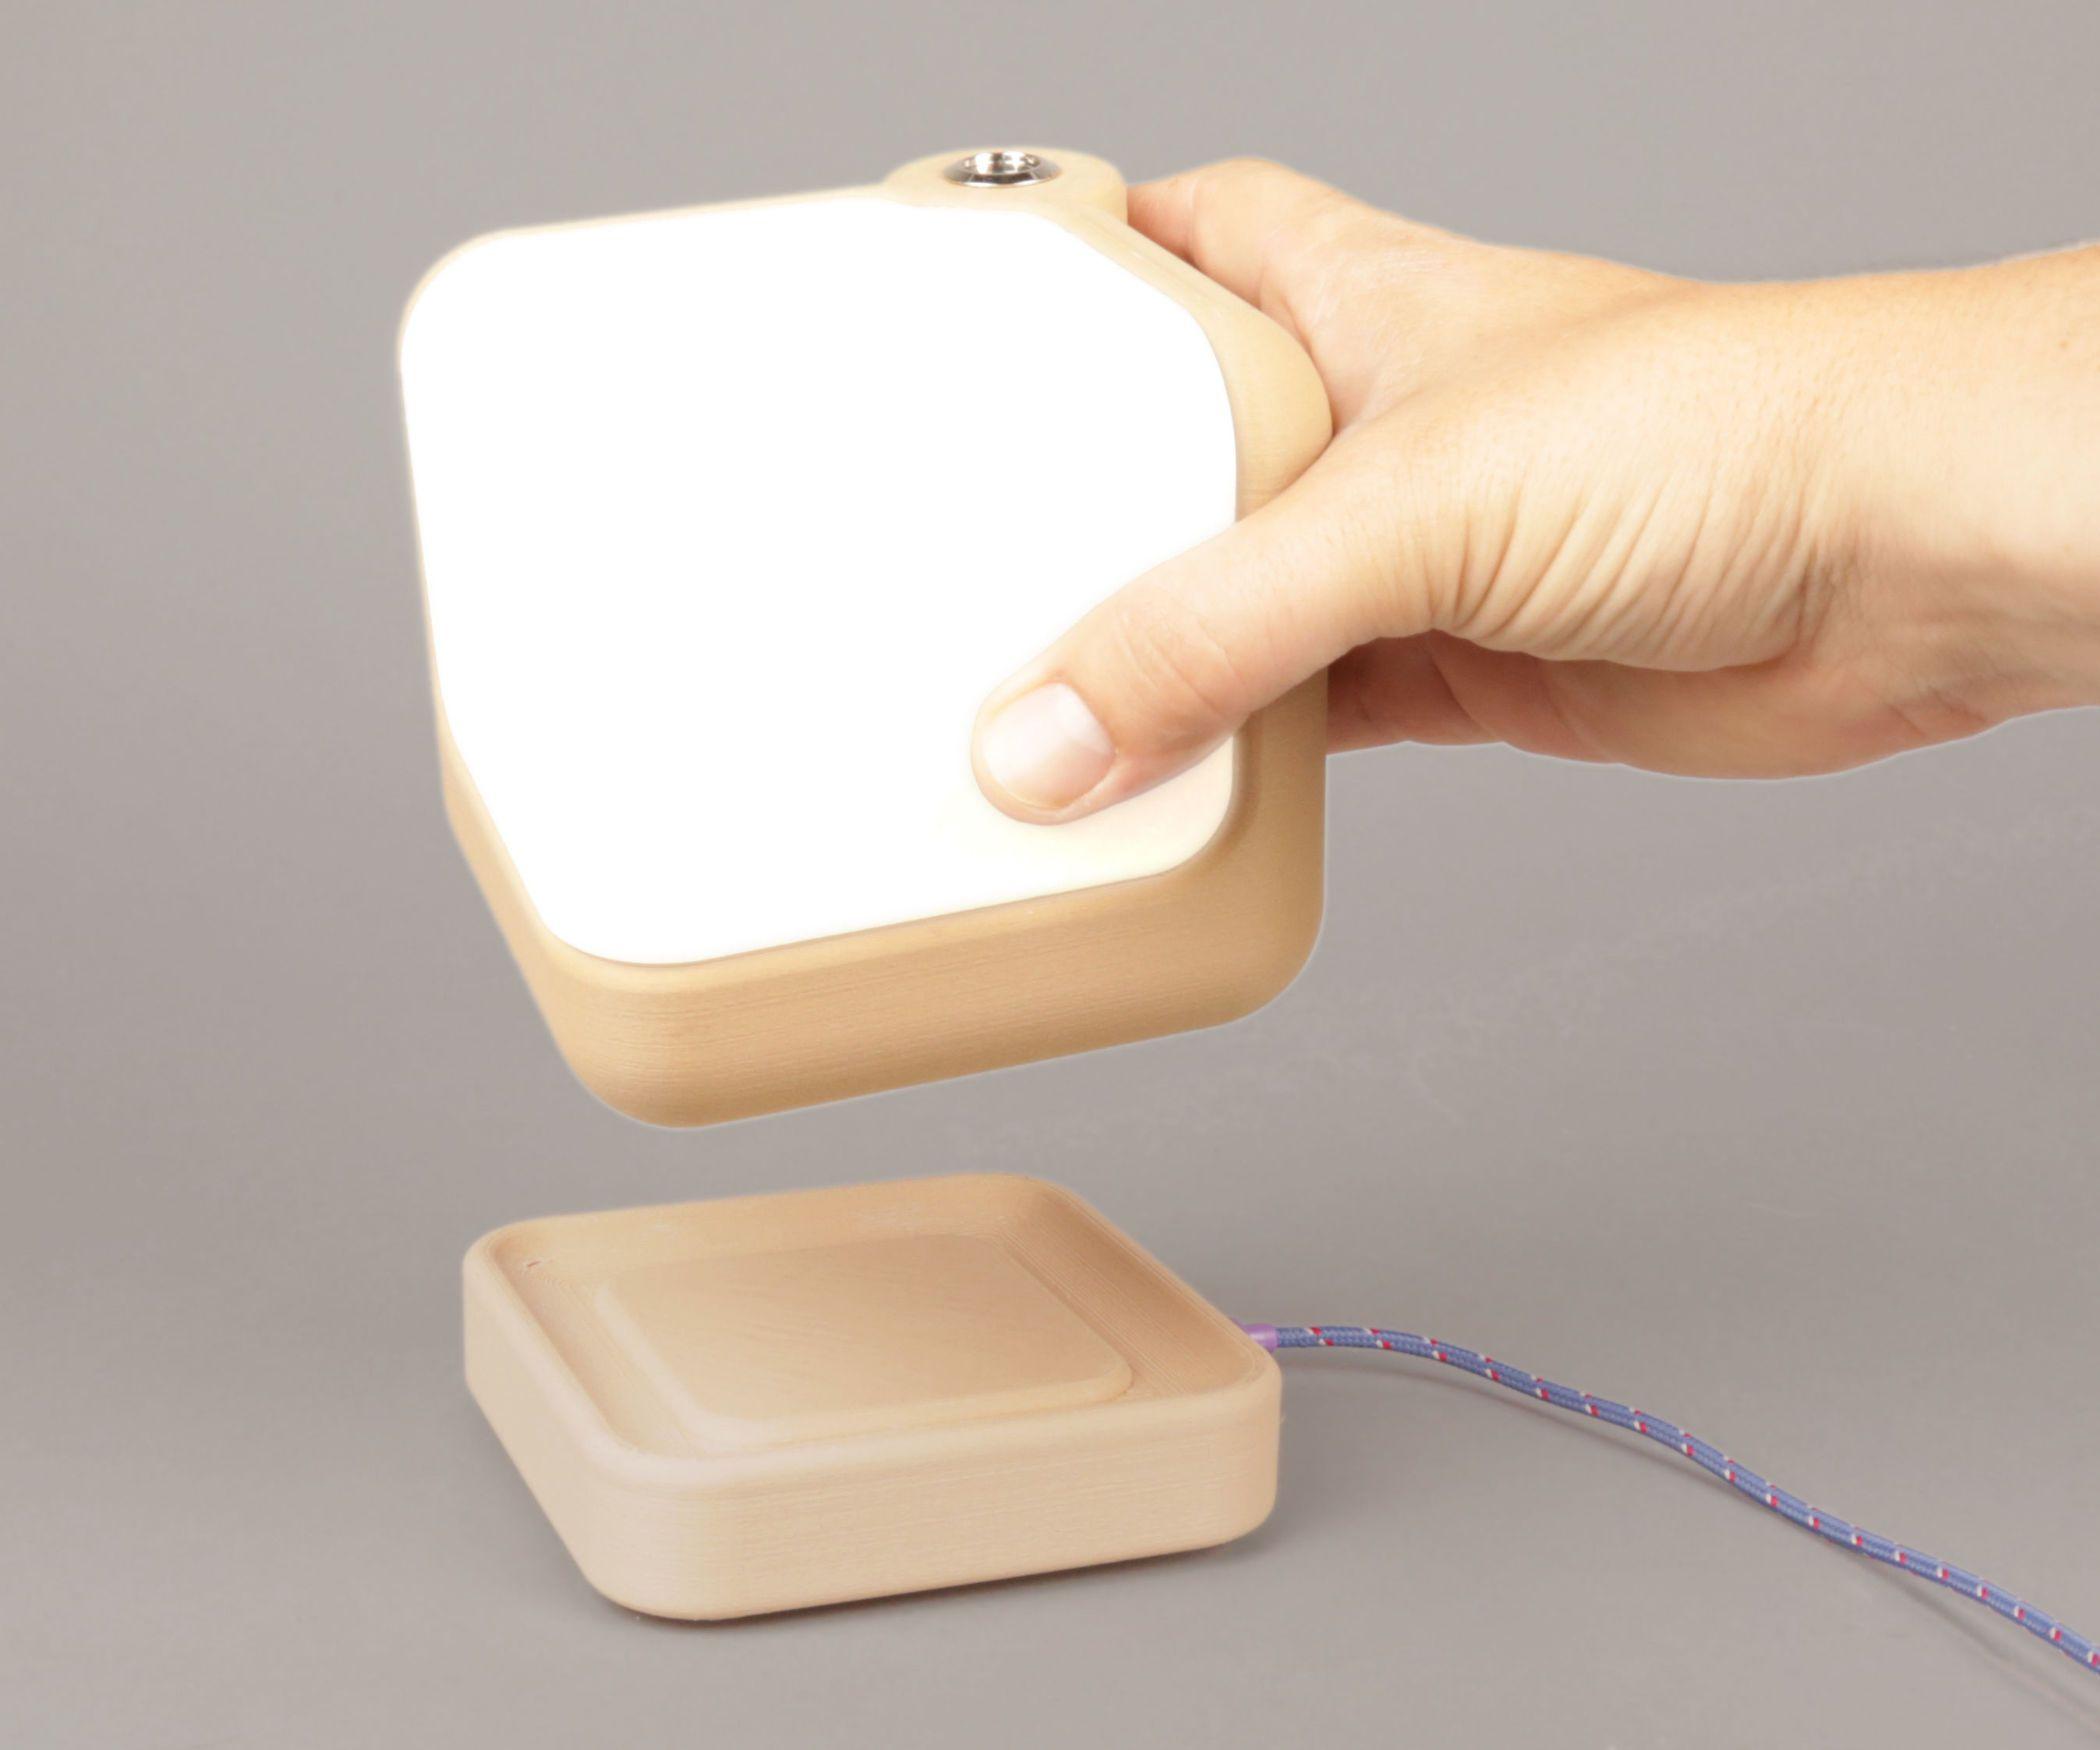 3d Printed Wireless Lantern Wireless Lantern Lanterns Wireless